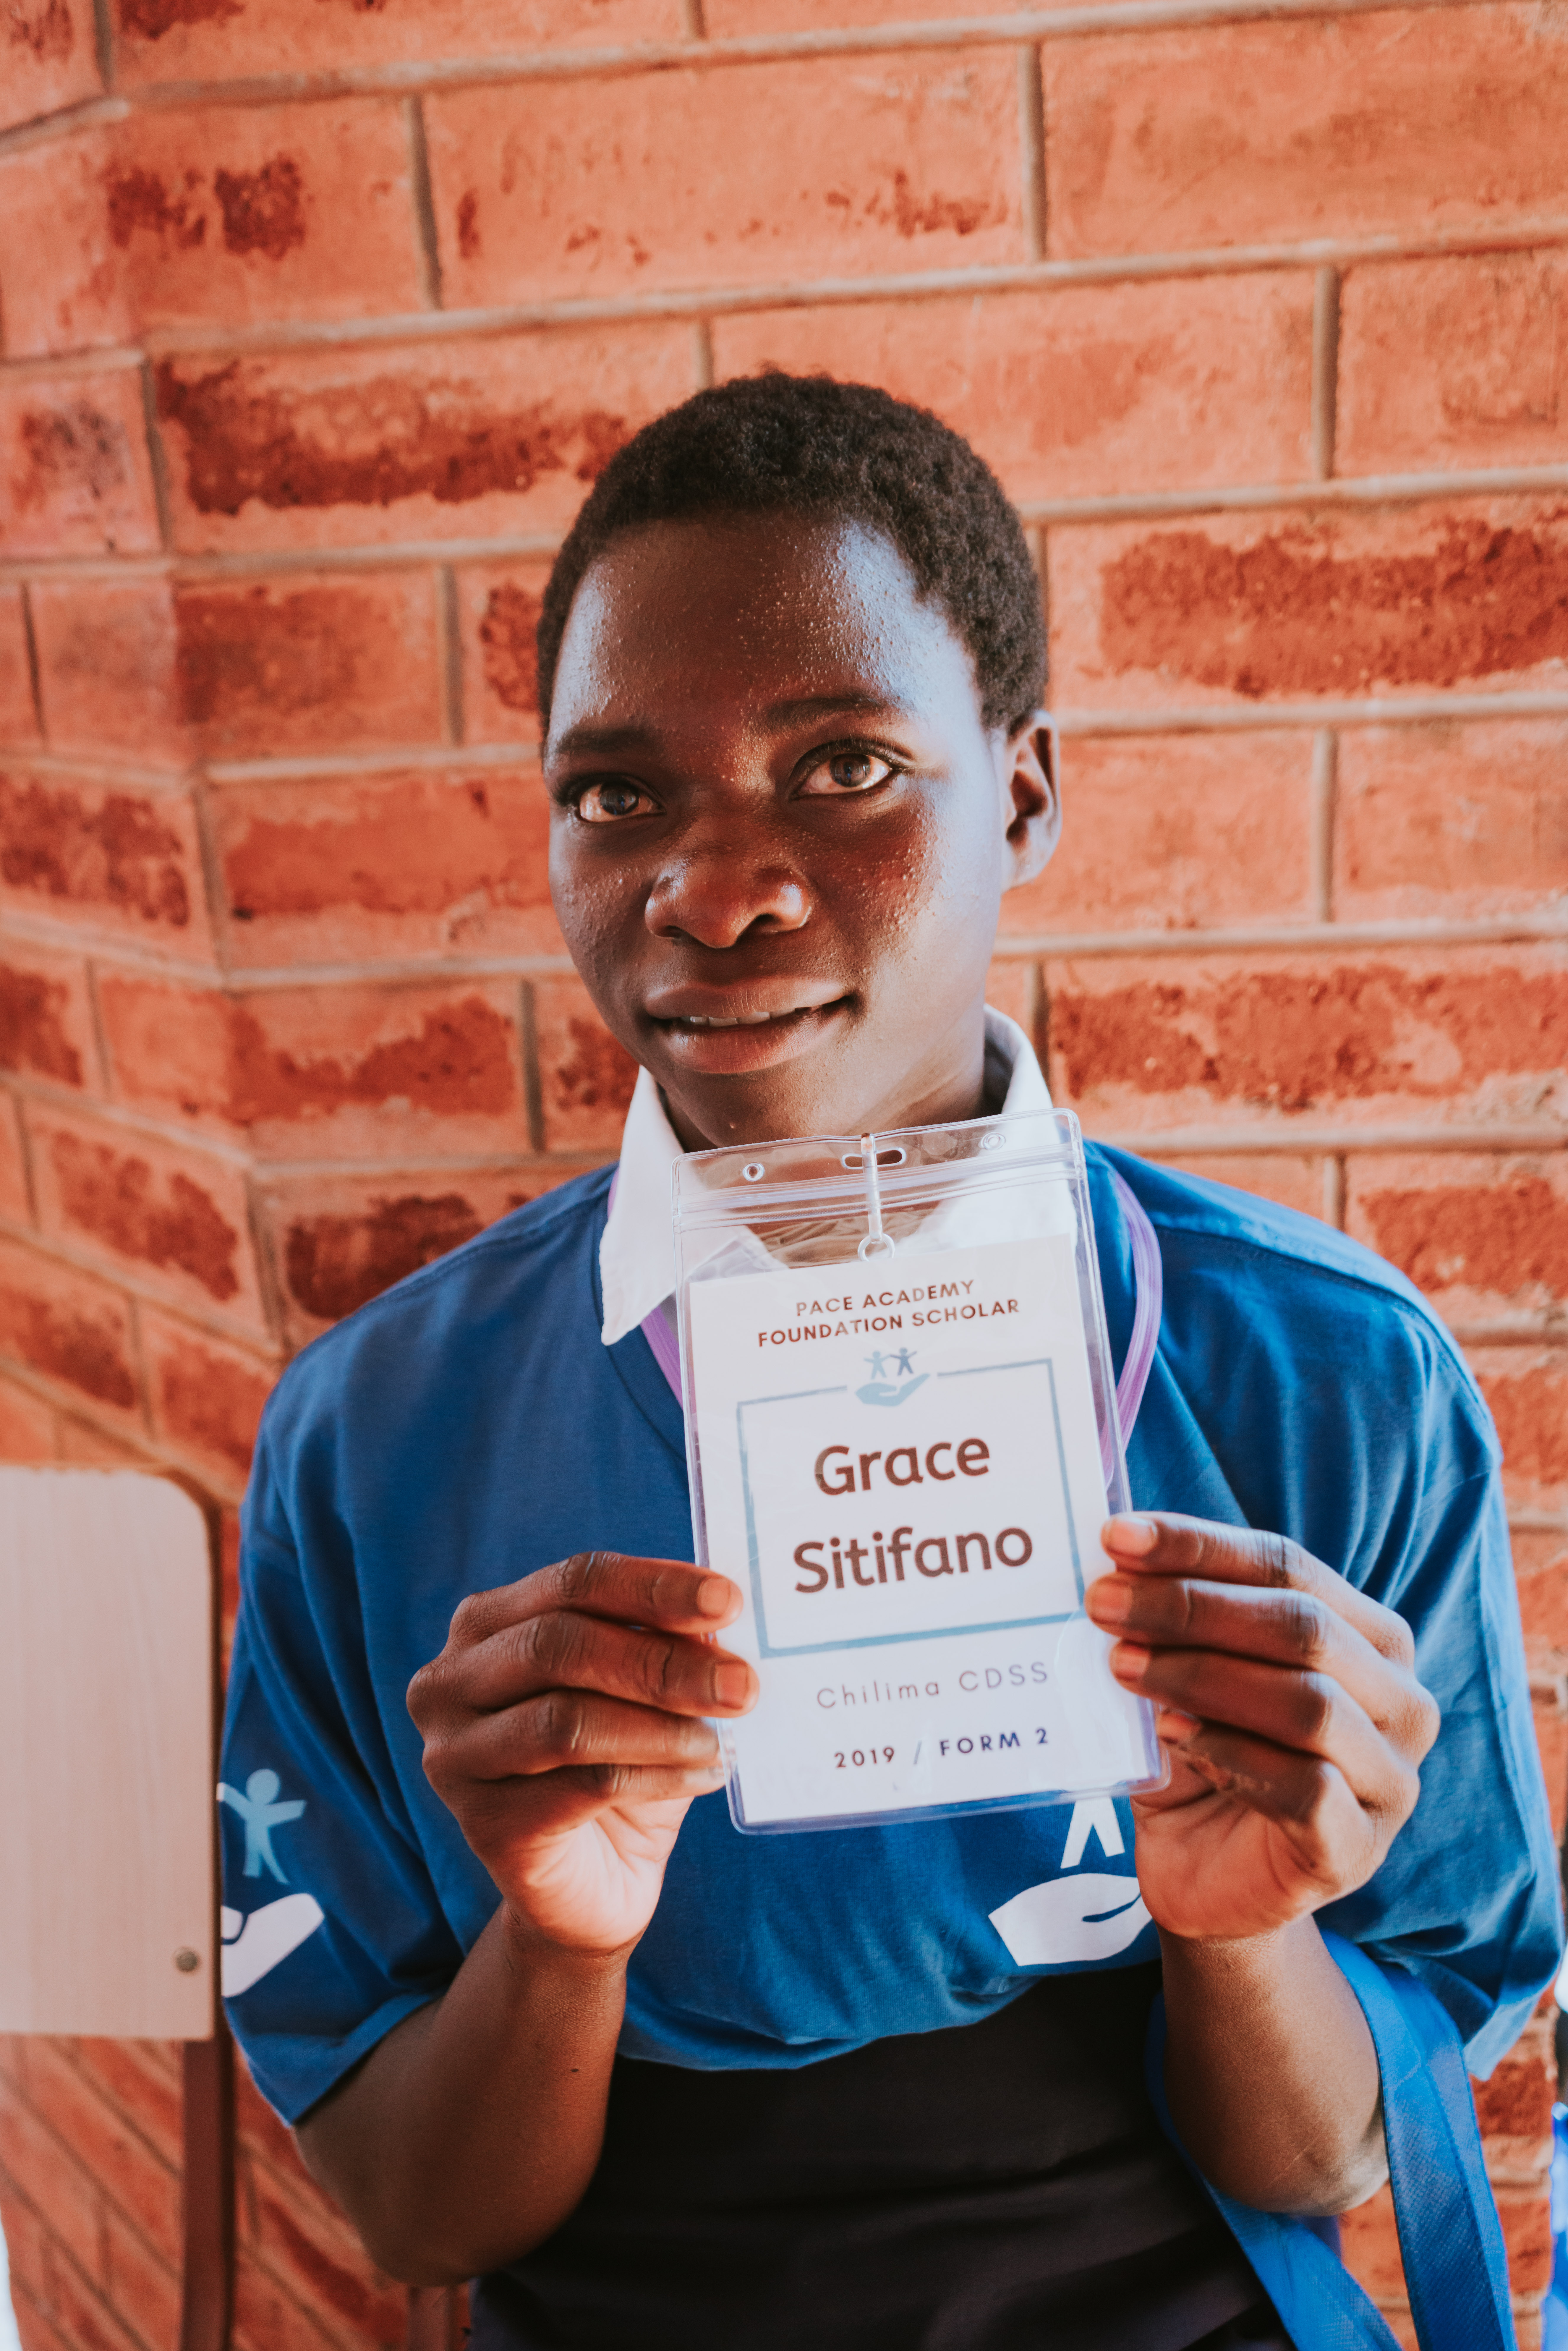 Grace Sitifano (Chilima CDSS)